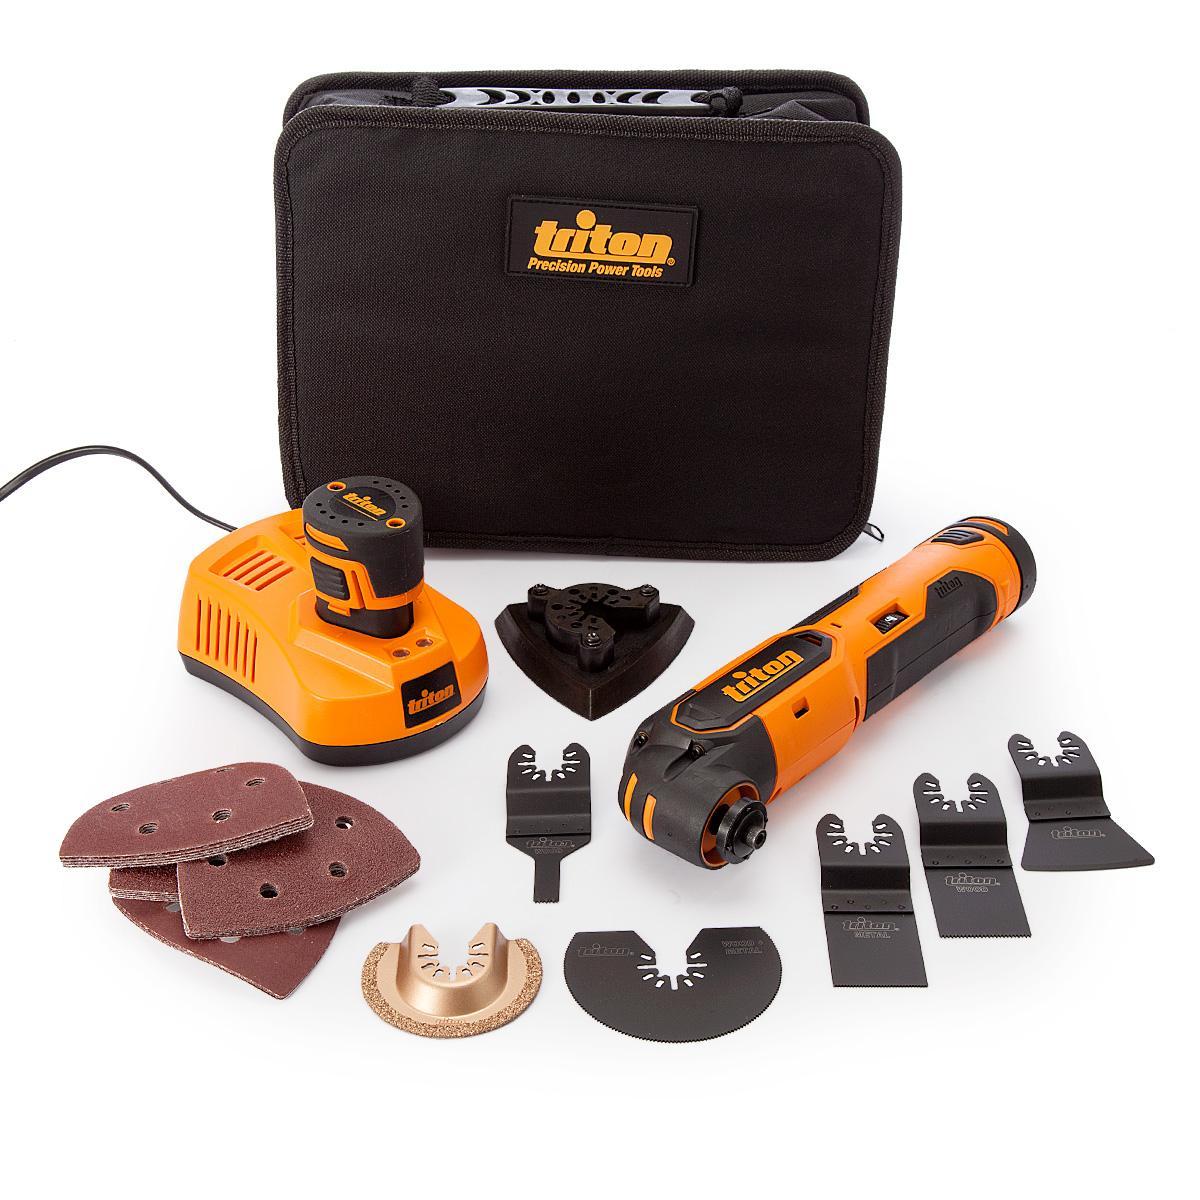 Triton T12OT Oscillating Multi-Tool 12V (103691) (2 x 1.5Ah Batteries) lowest price